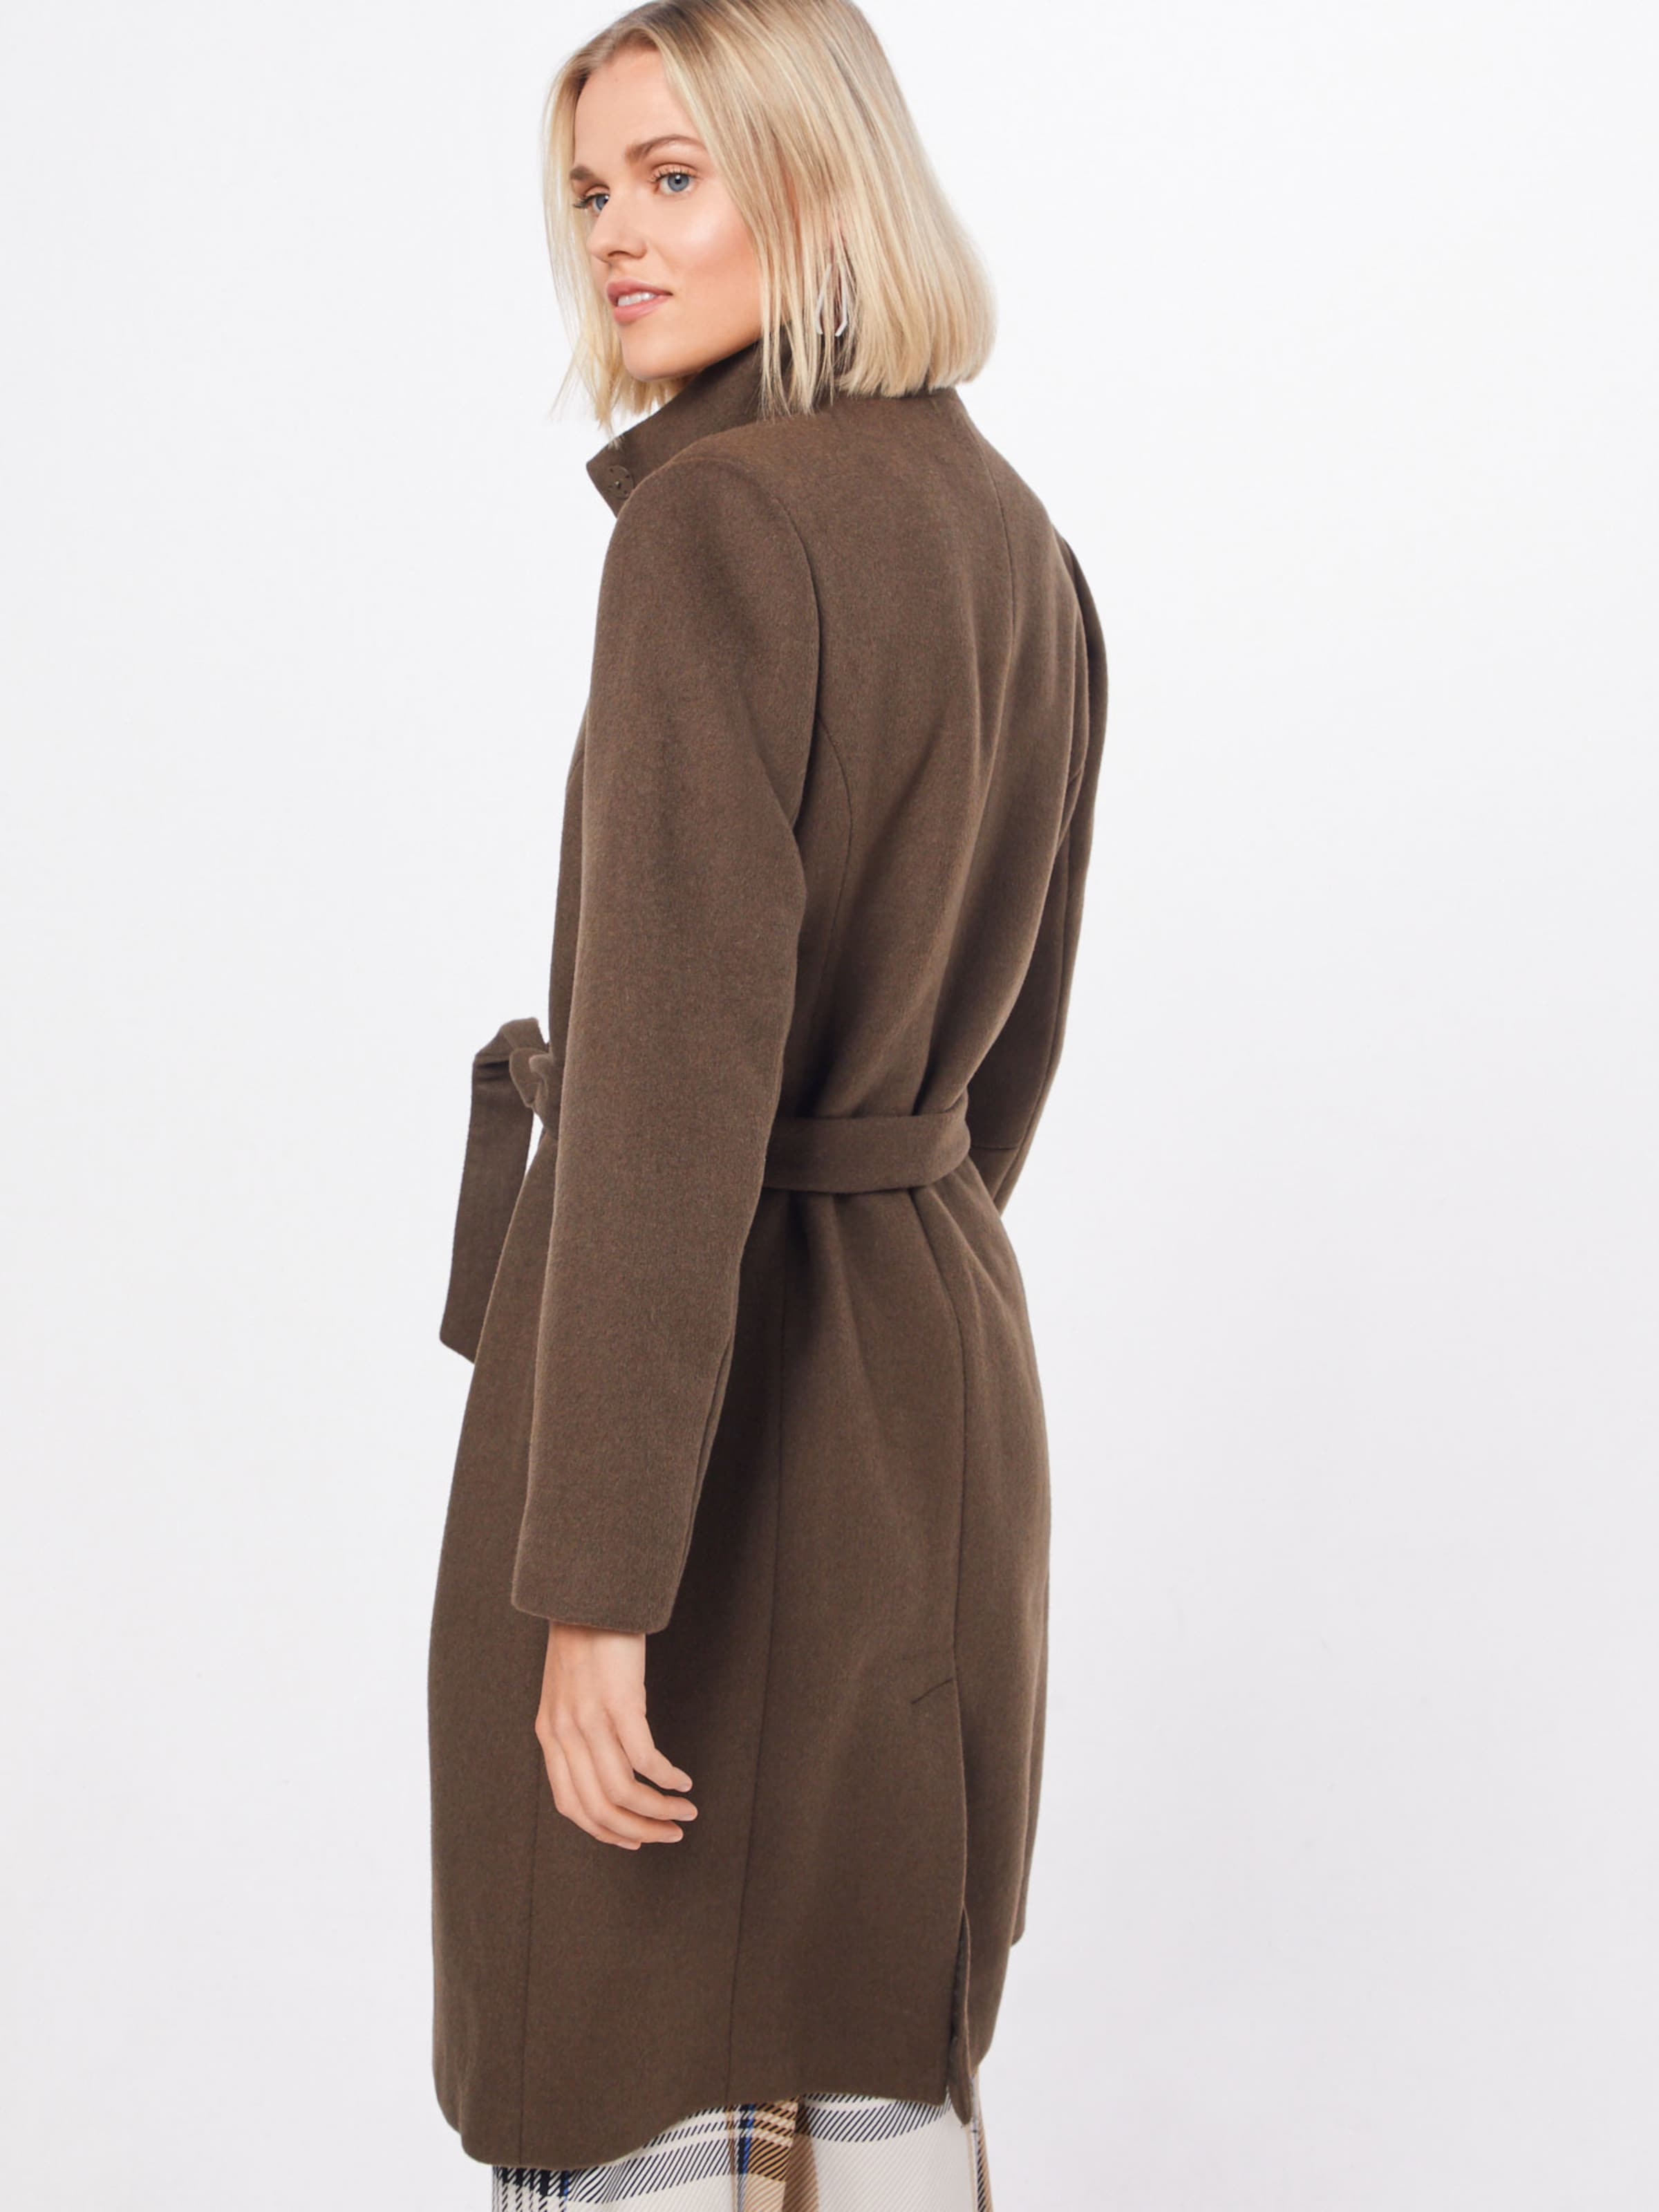 Greta' En saison Bruuns Camel 'jasmin Bazaar Manteau Mi TlF1JcK3